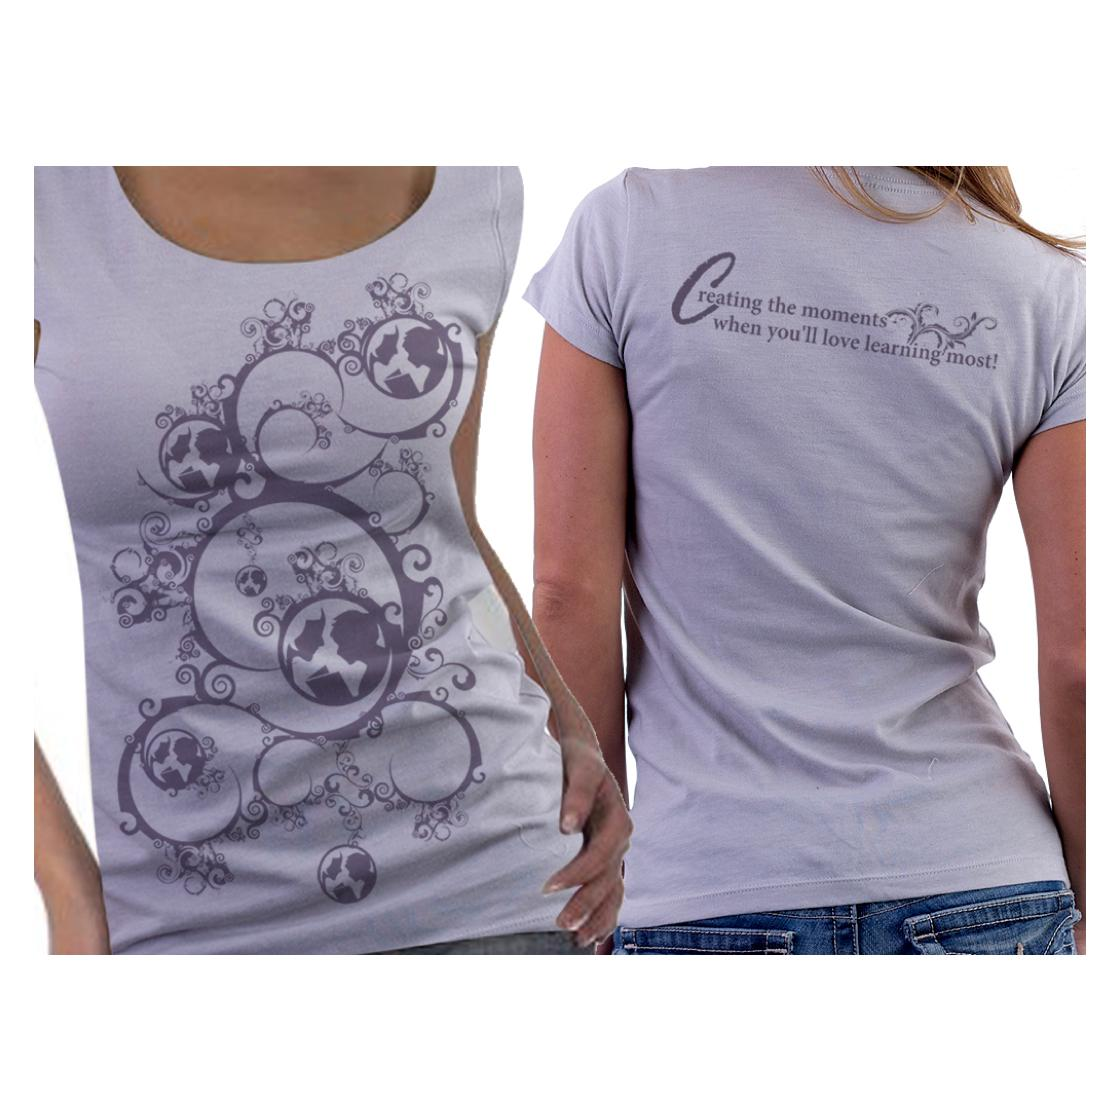 crowdspring custom t-shirt design by akosiaki